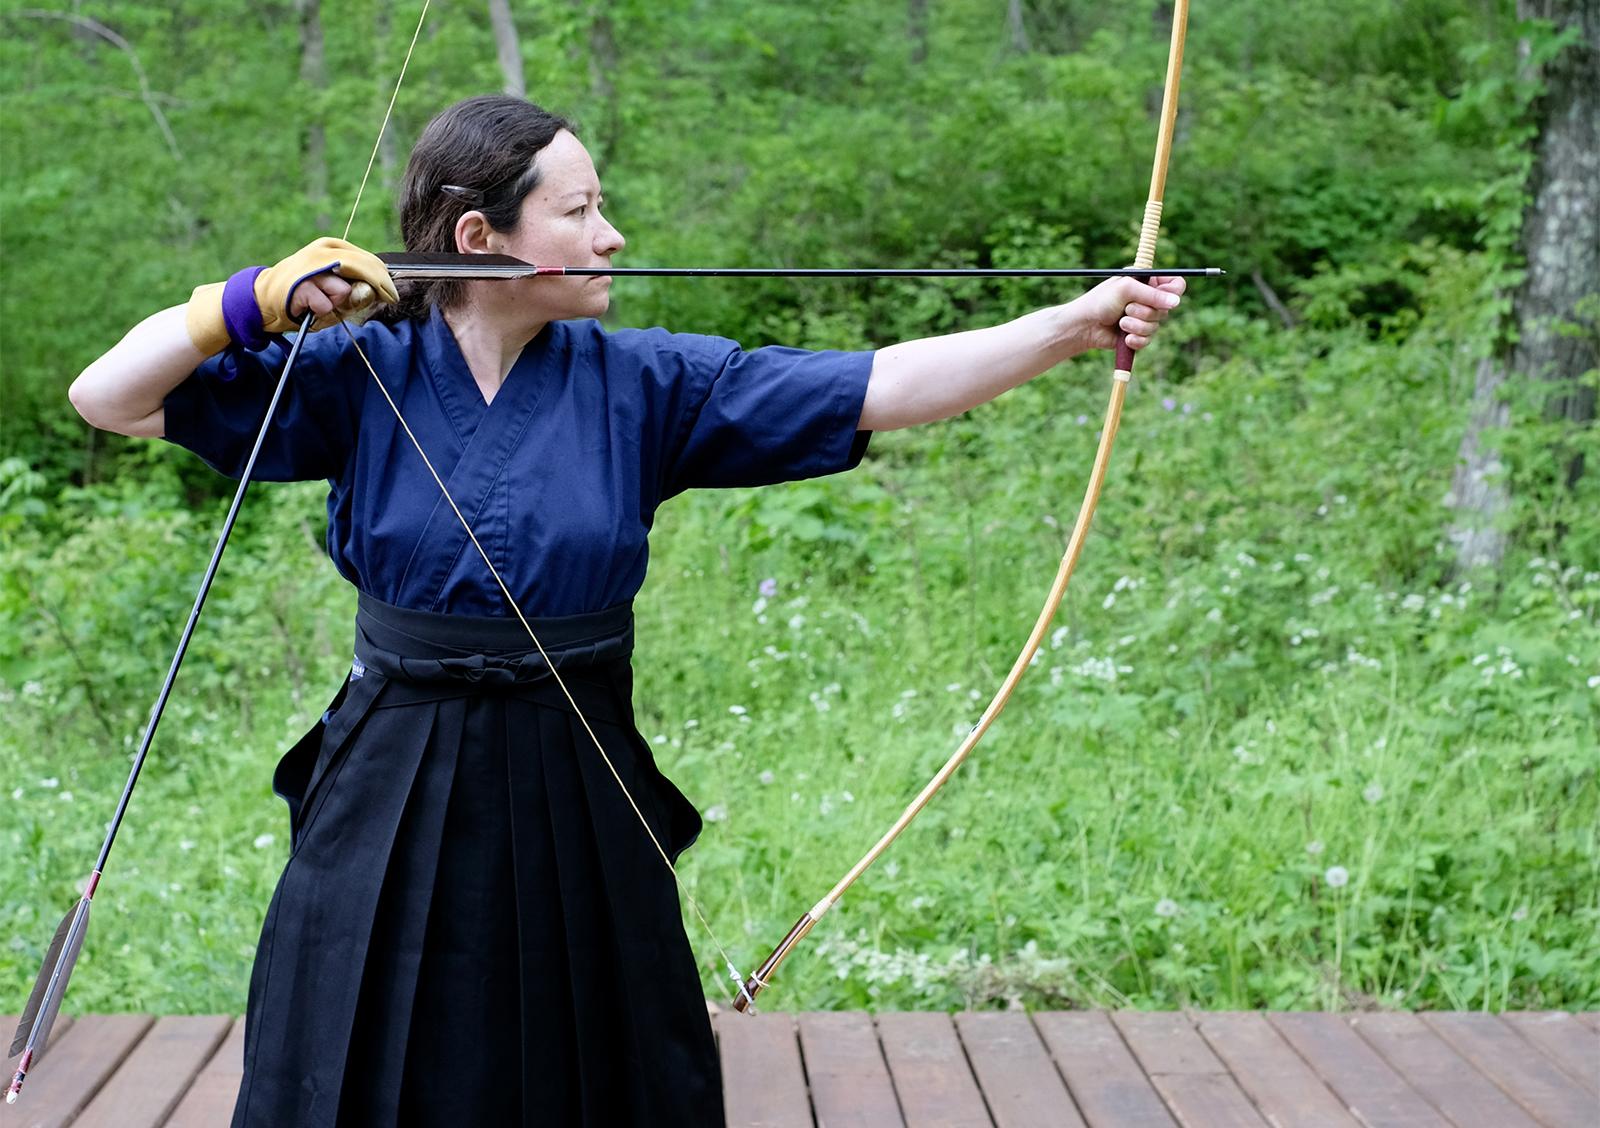 An individual practices archery at Chosei Zen dojo in Madison, Wisconsin. Photo courtesy of Anita Taylor/Chosei Zen